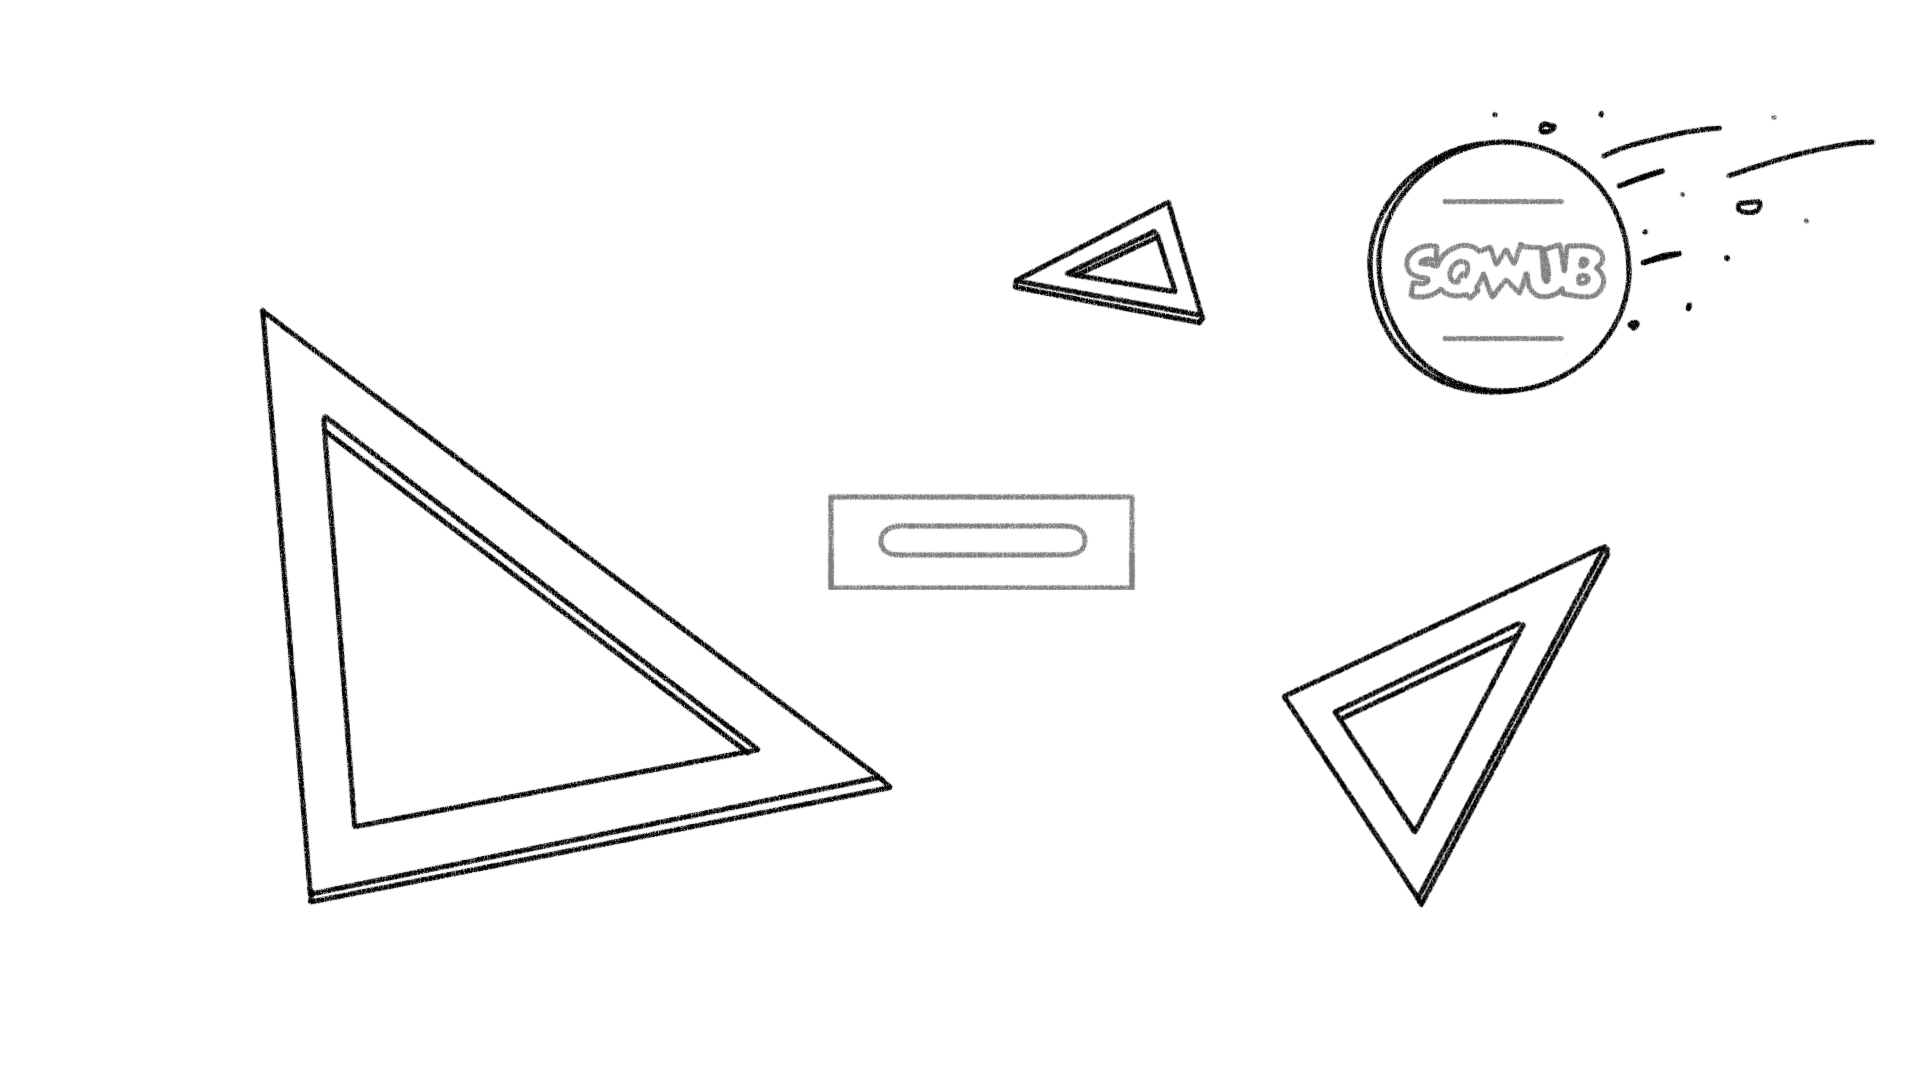 SQWUB-Storyboard-3.png